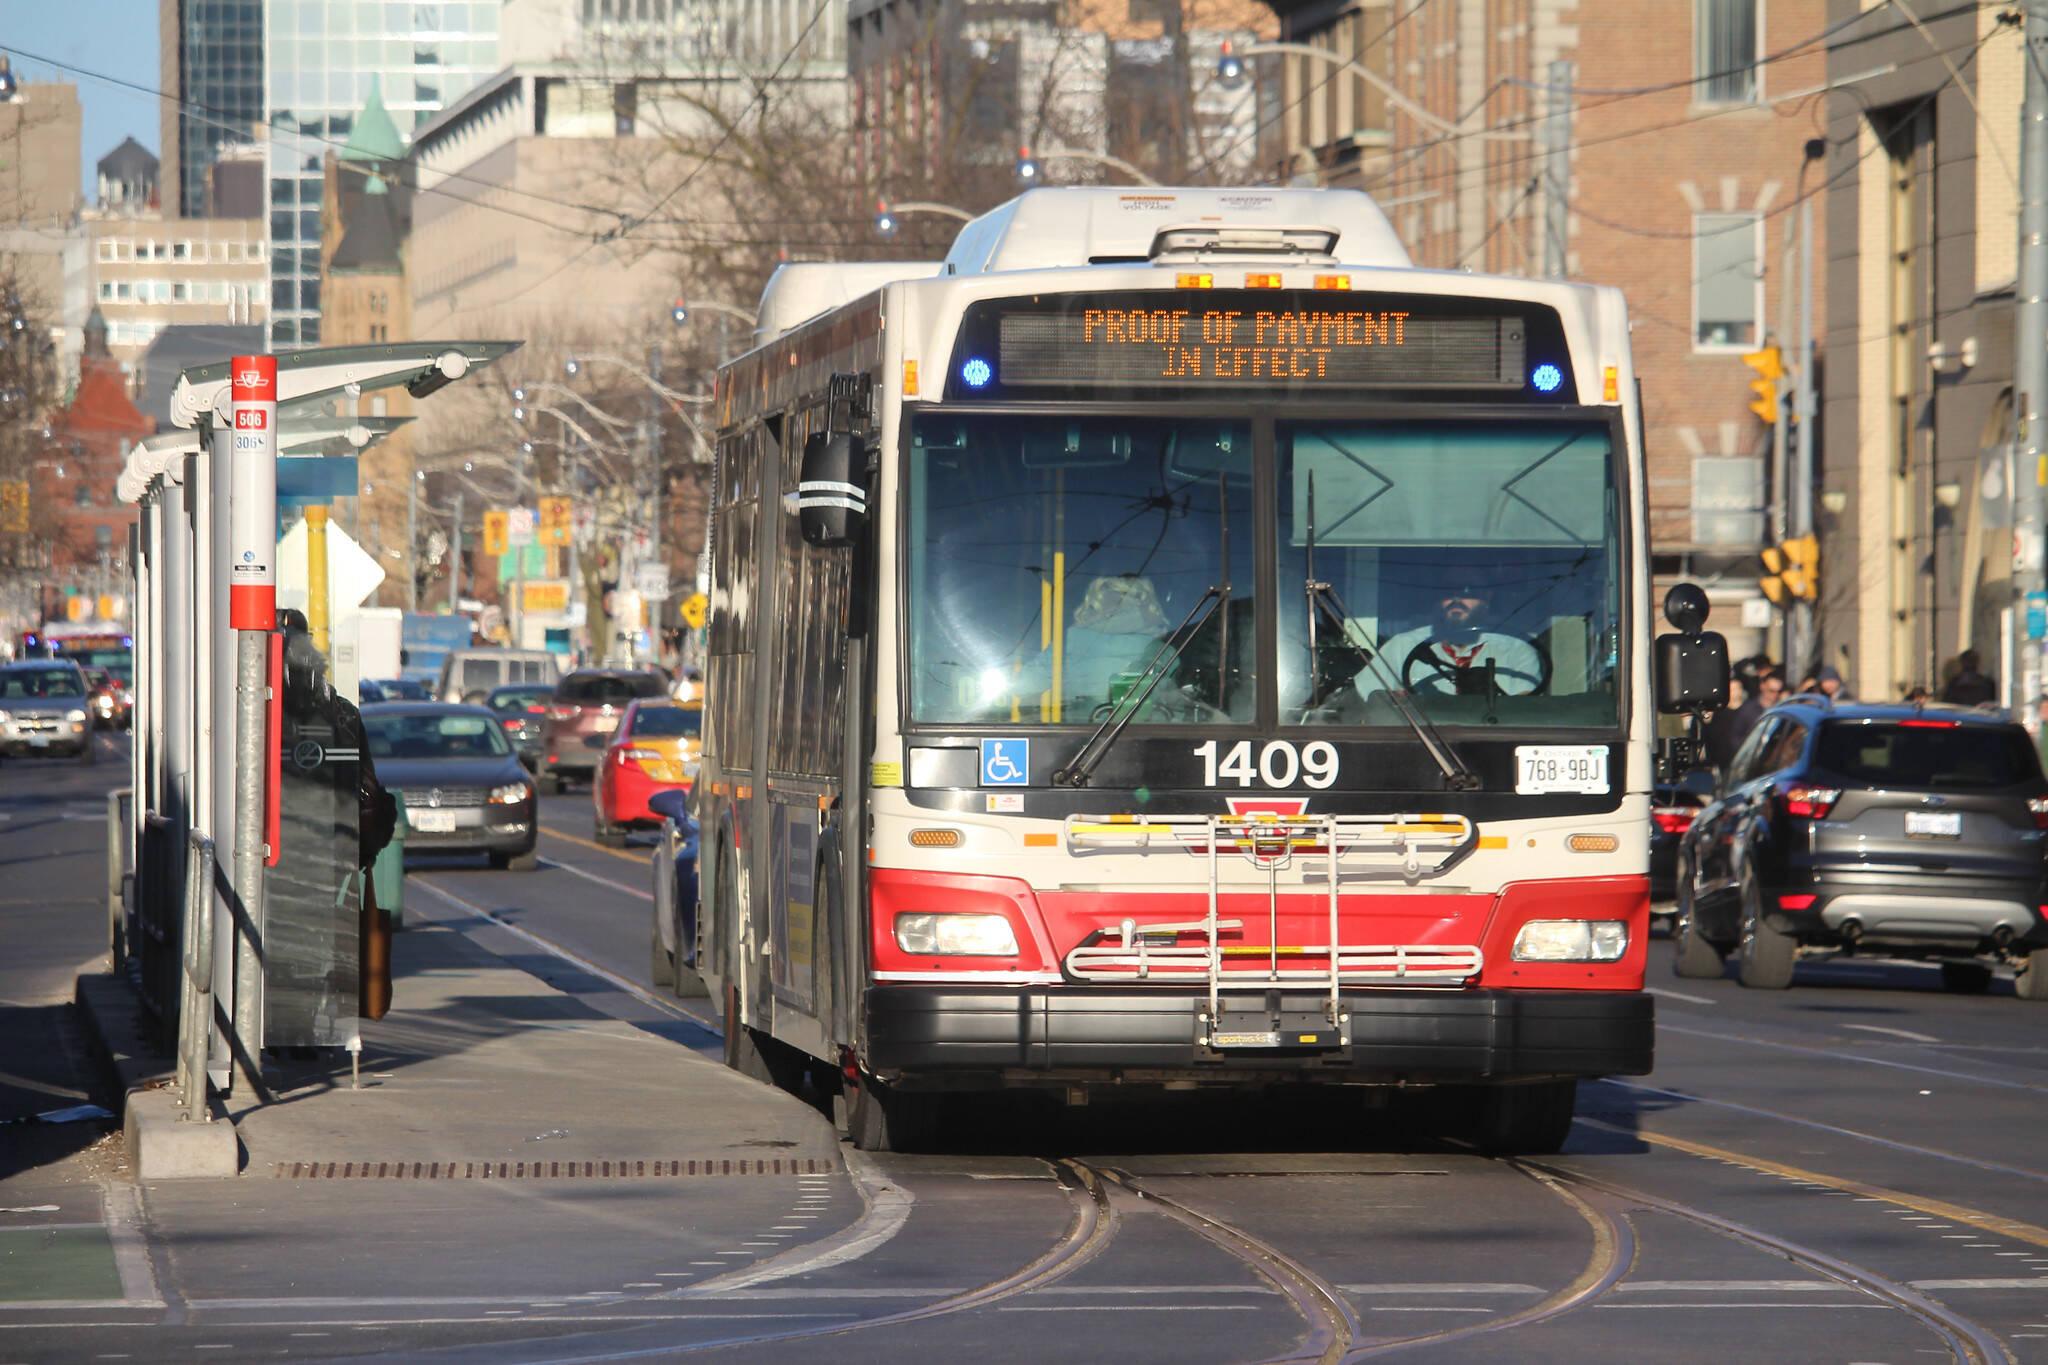 ttc ridership increase